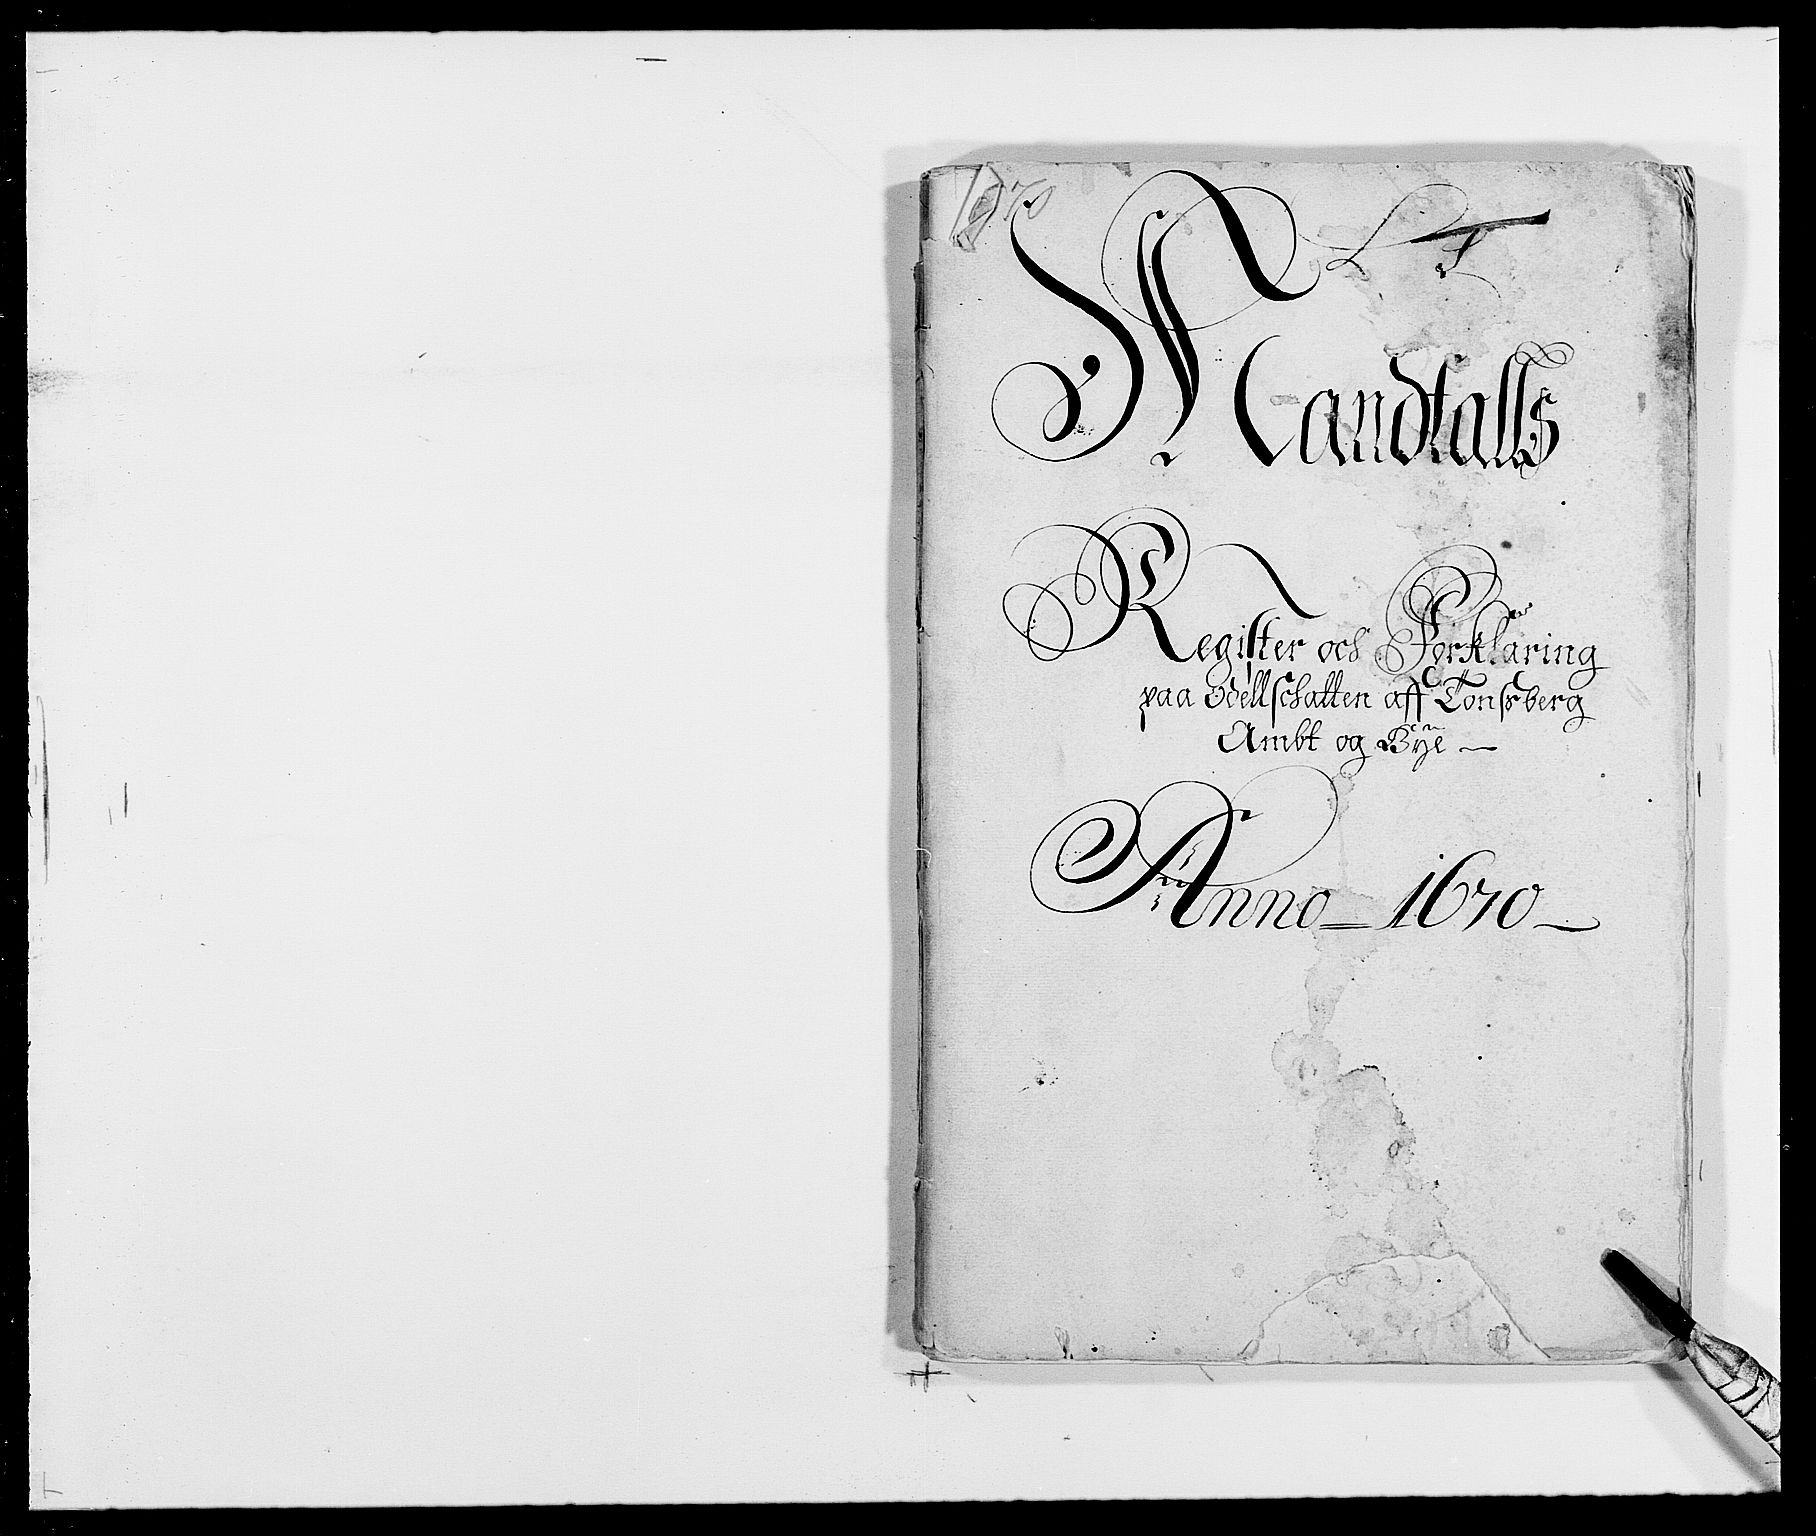 RA, Rentekammeret inntil 1814, Reviderte regnskaper, Fogderegnskap, R32/L1841: Fogderegnskap Jarlsberg grevskap, 1664-1673, s. 1